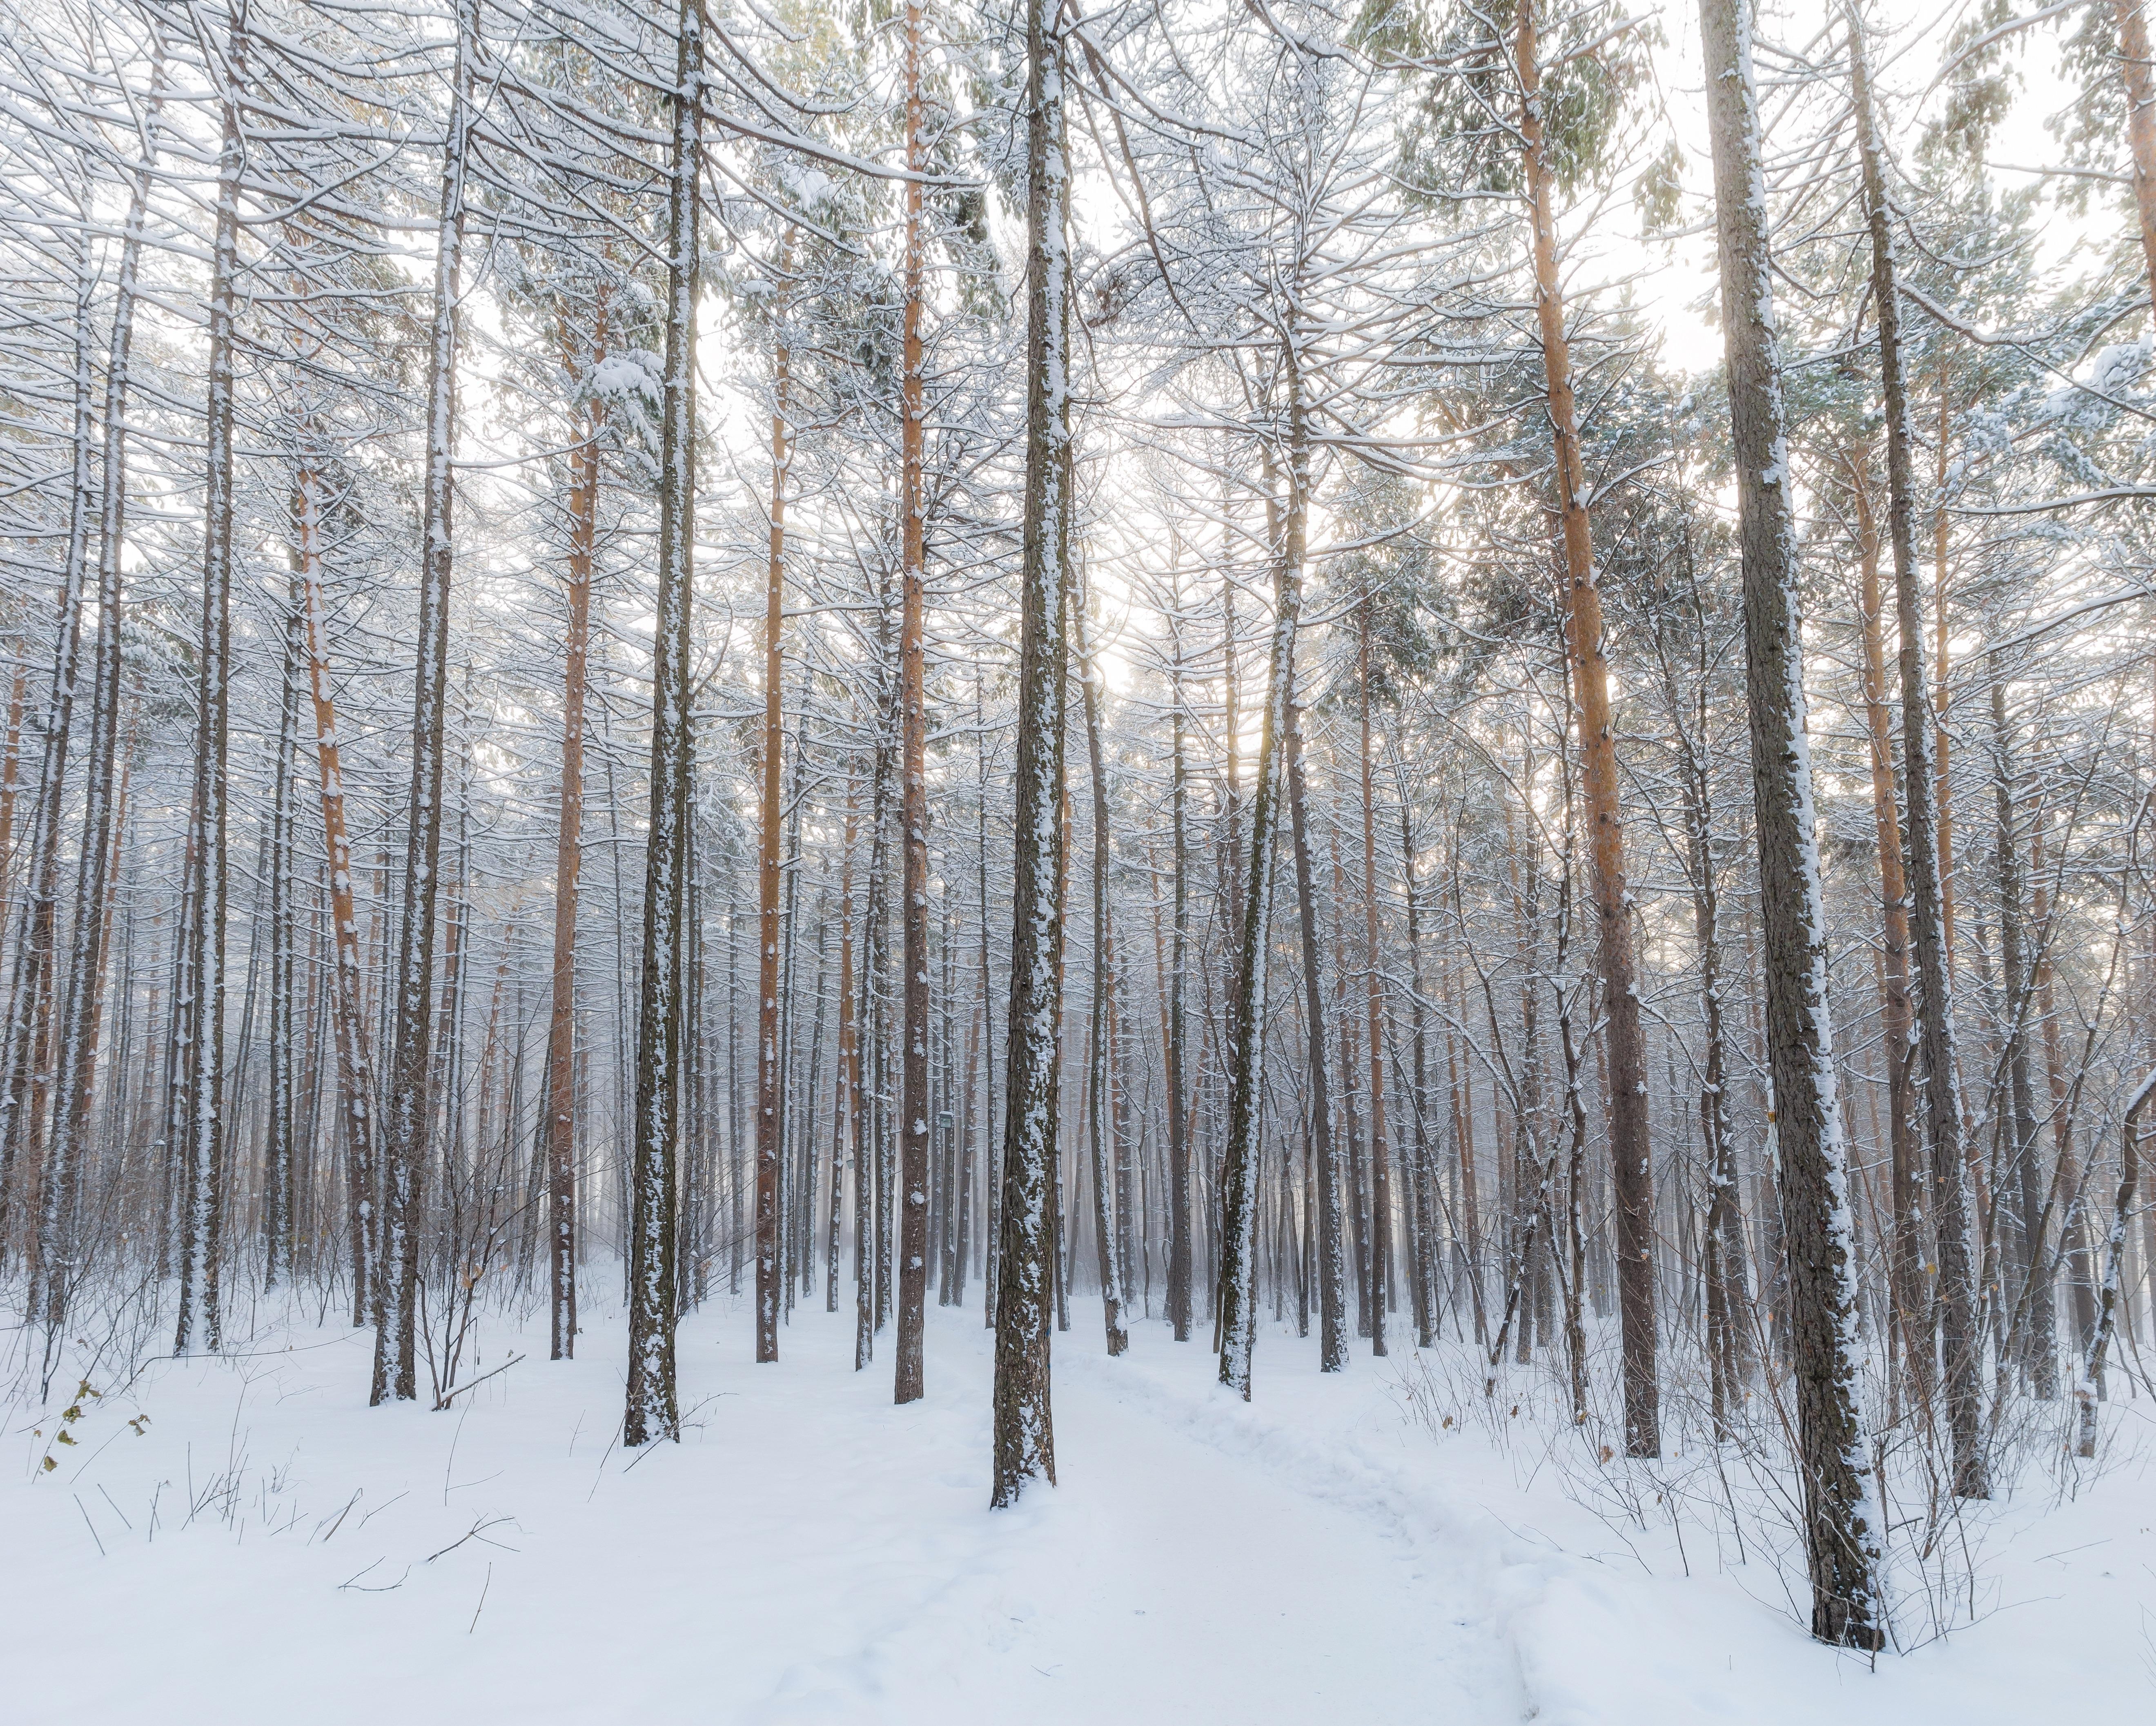 photo: michail prohorov